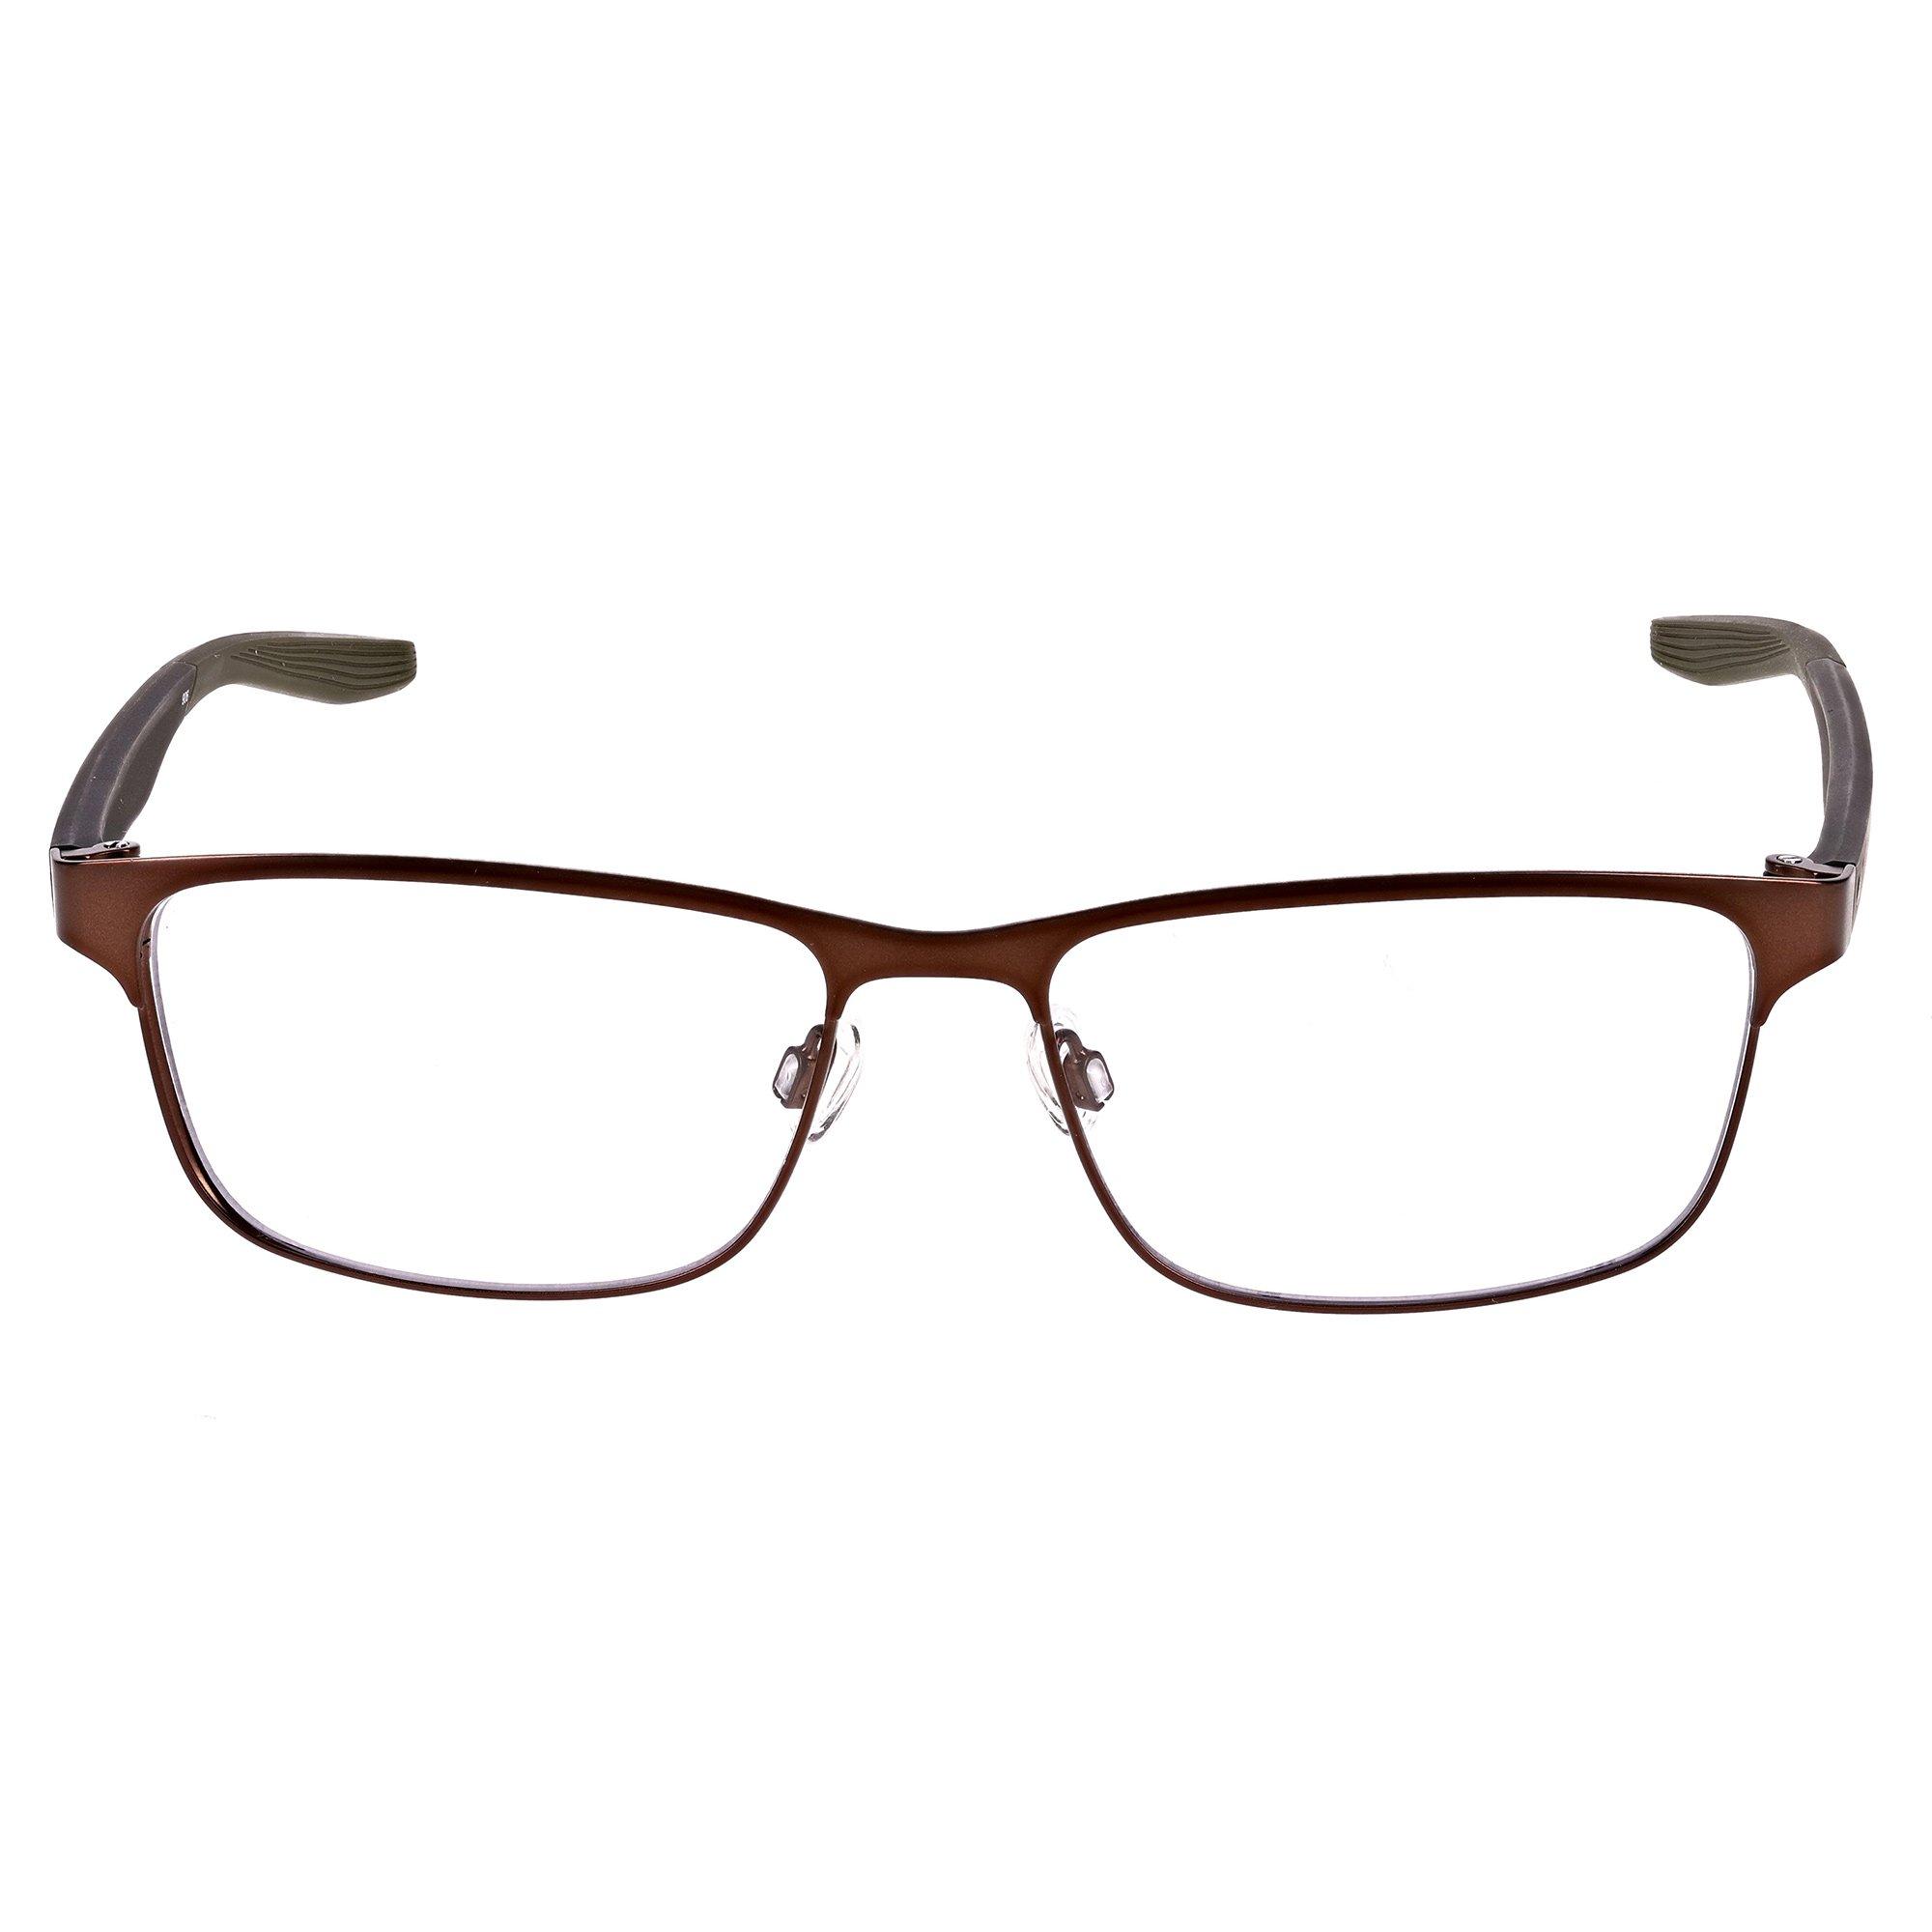 palo Mal Pobreza extrema  Eyeglasses NIKE 8175 210 SATIN BROWN Sunglasses & Eyewear Accessories  Eyewear Frames